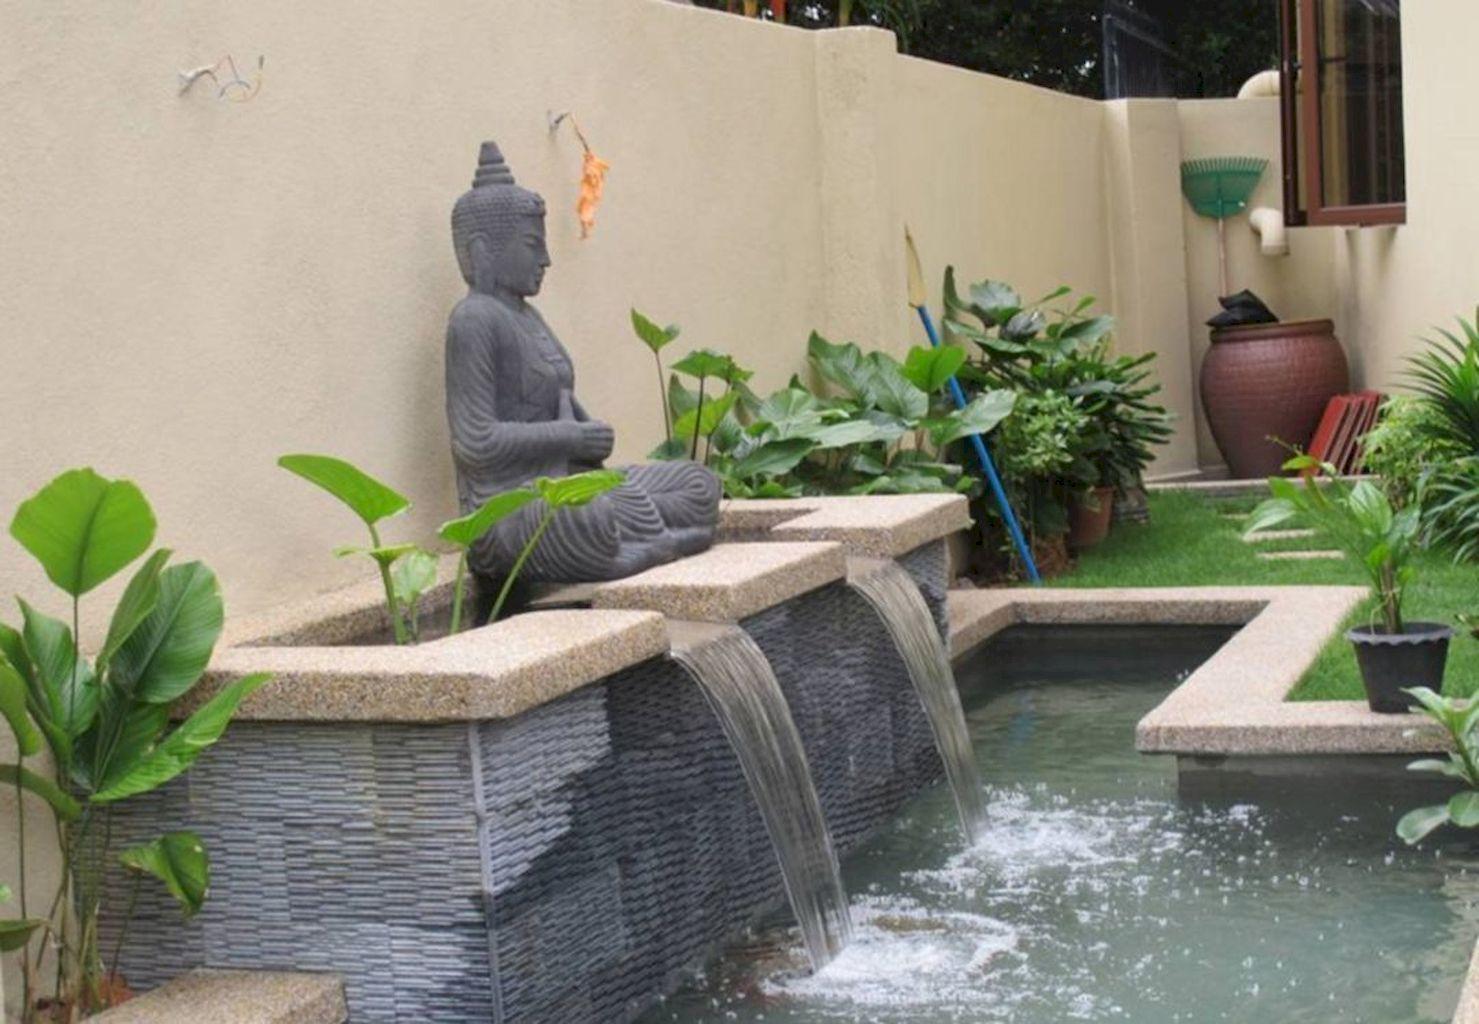 Brilliant How To Make A Fish Pond At Home Fish Ponds Backyard Koi Pond Design Outdoor Fish Ponds